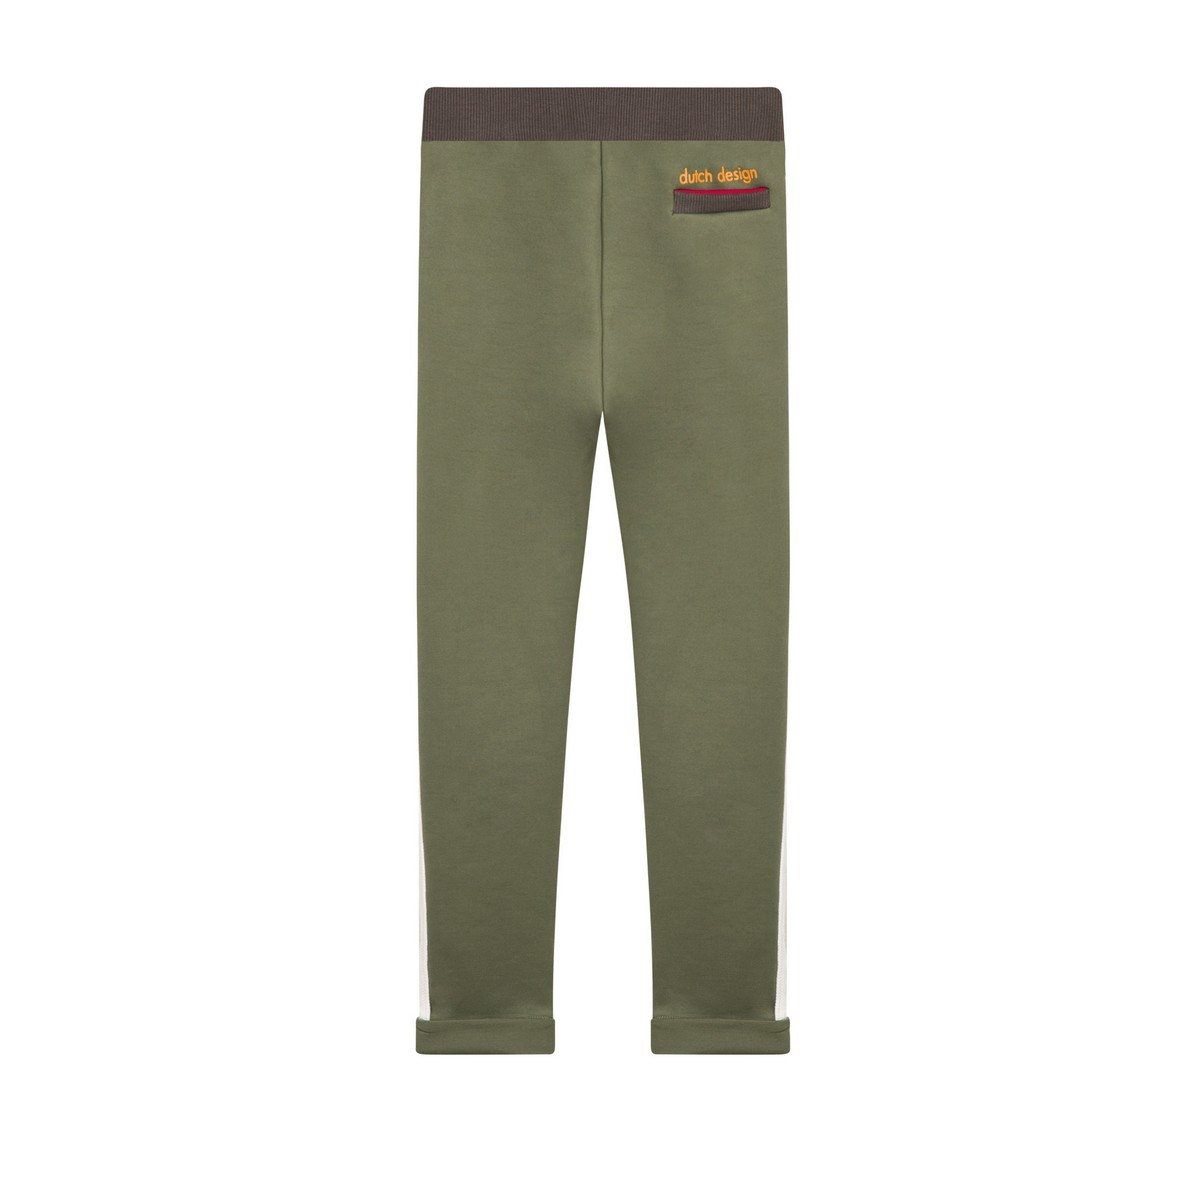 Ninni Vi sweatpants army green (NVFW18-58)